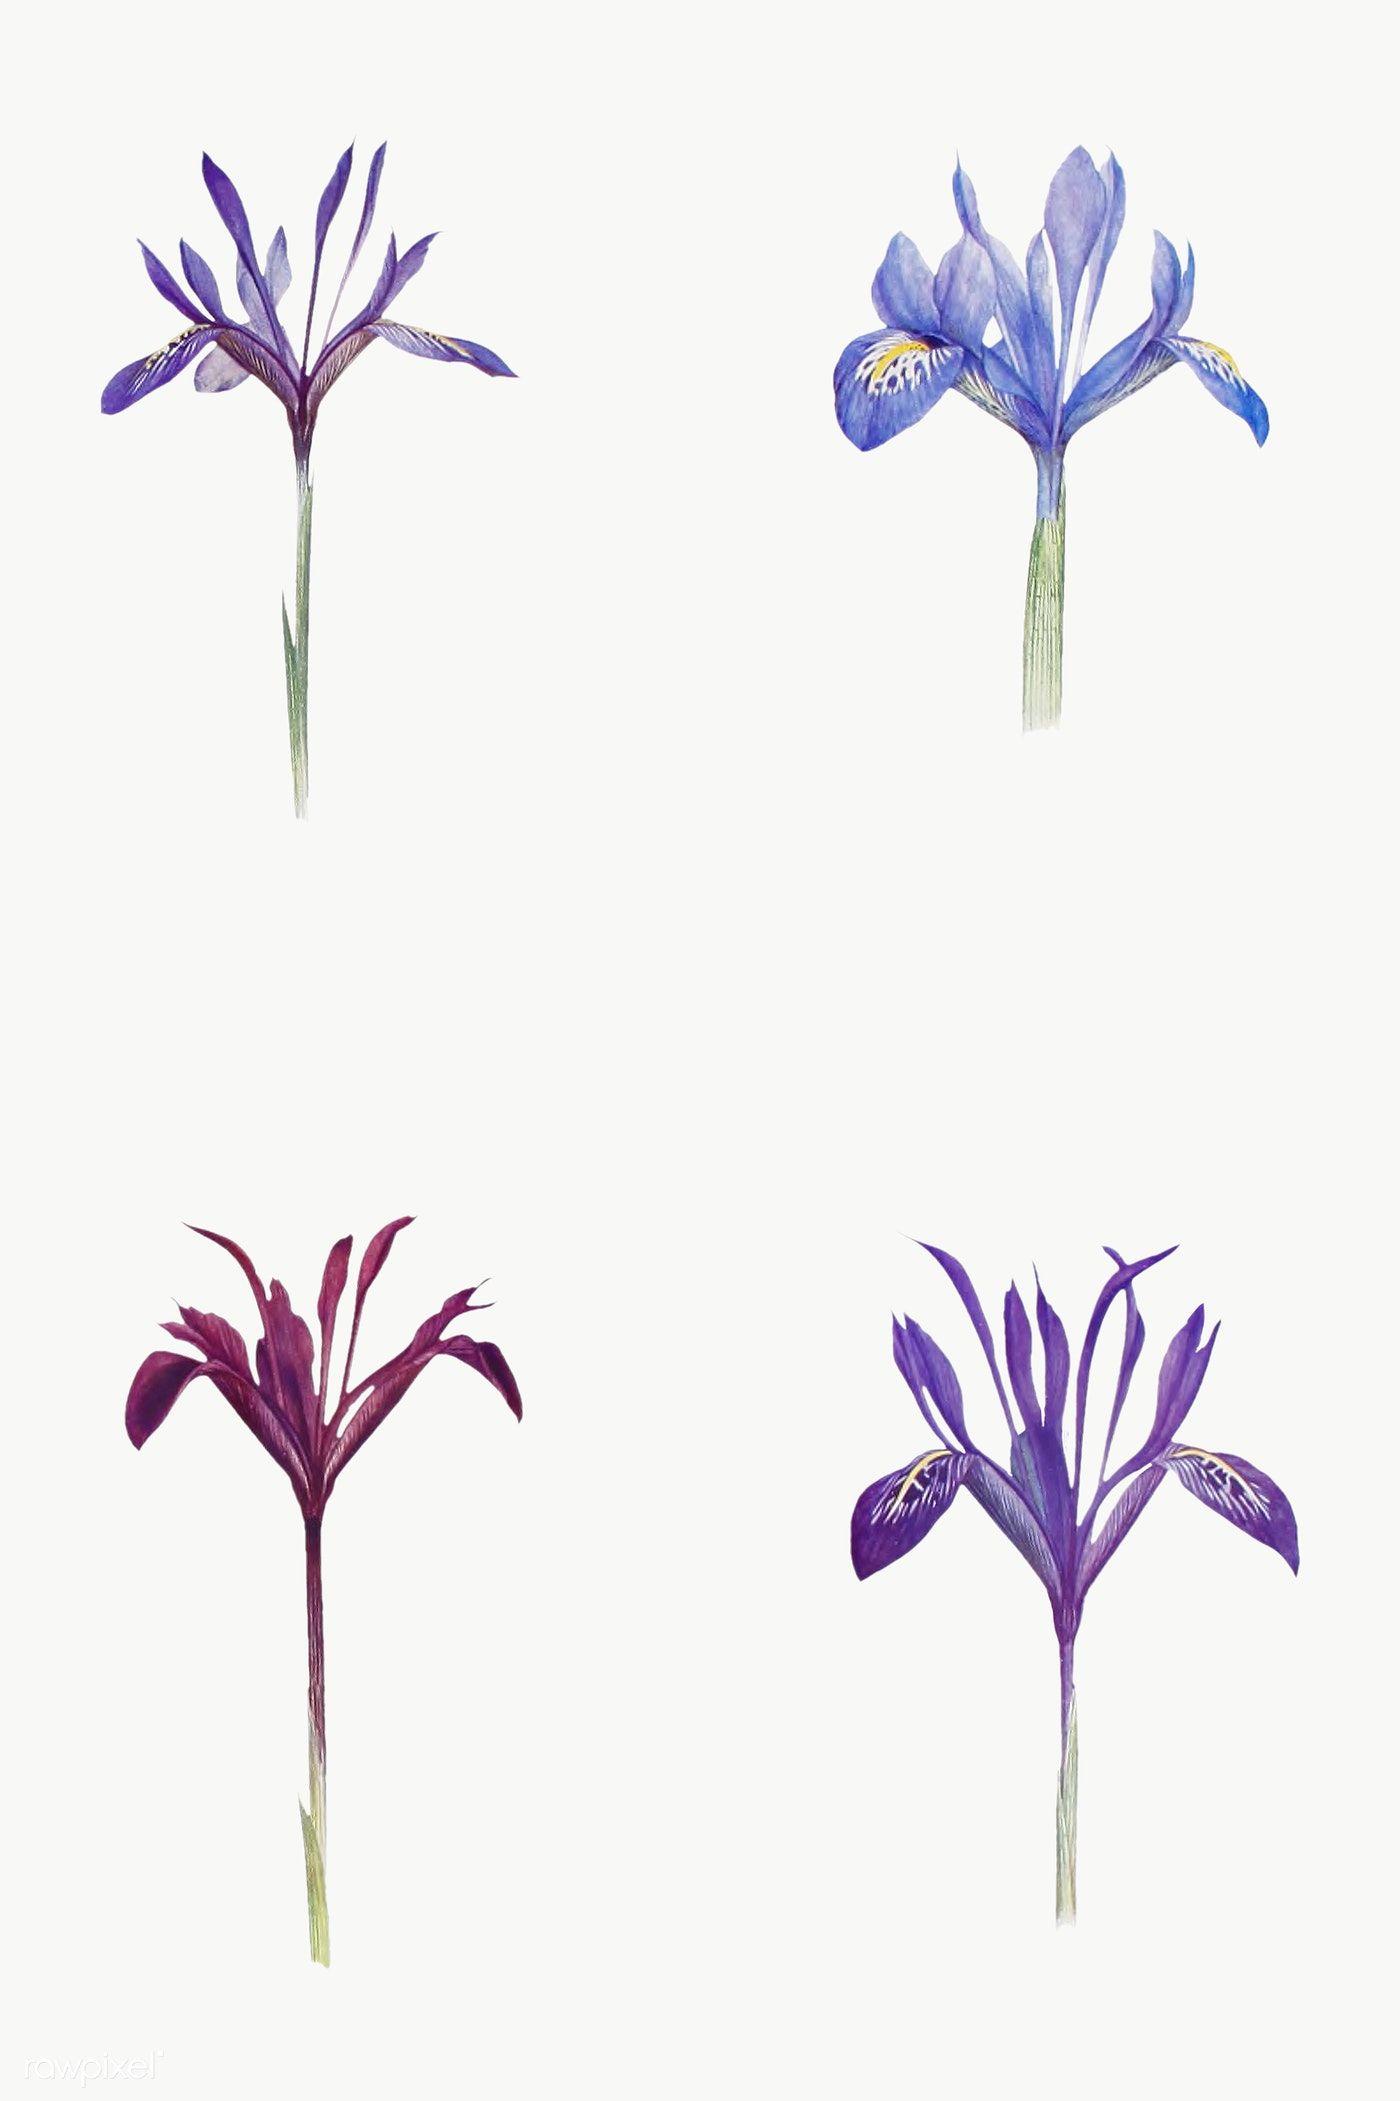 Vintage Iris Flower Illustrations Collection Transparent Png Premium Image By Rawpixel Com Iris Flowers Iris Flower Tattoo Flower Illustration